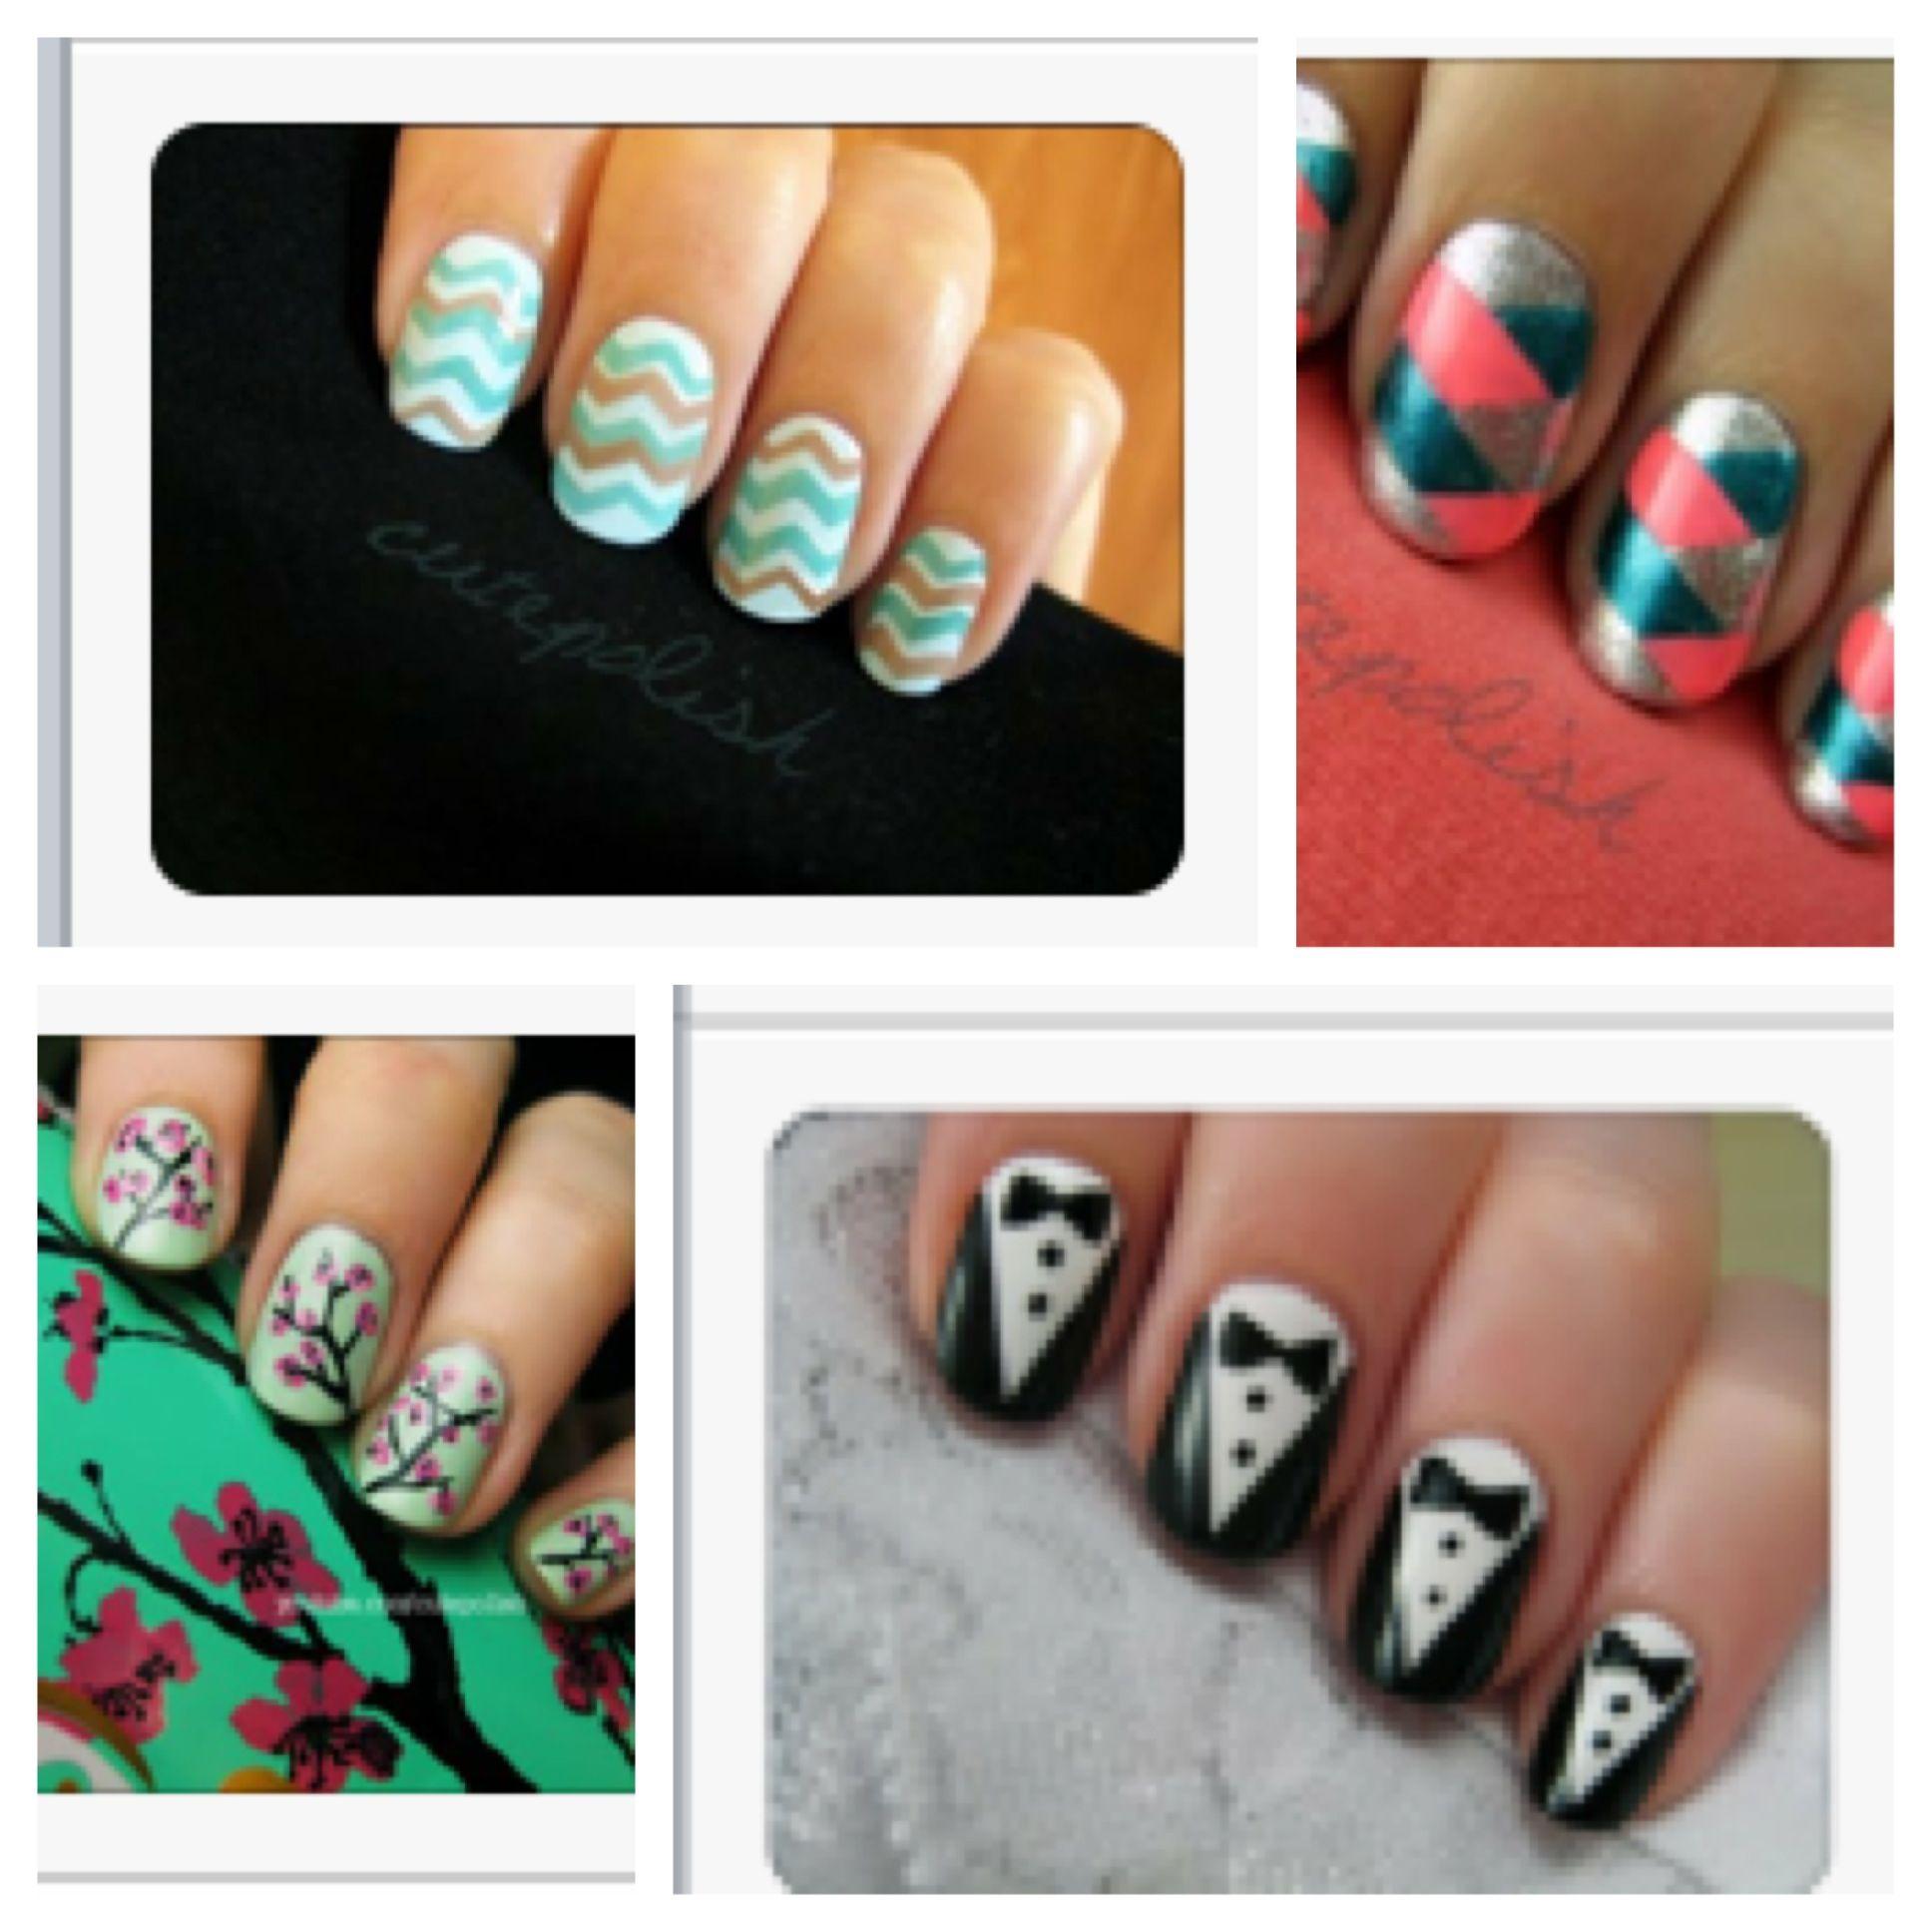 Cute nail designs by Cutepolish | Nails <3 | Pinterest | Süße Nägel ...